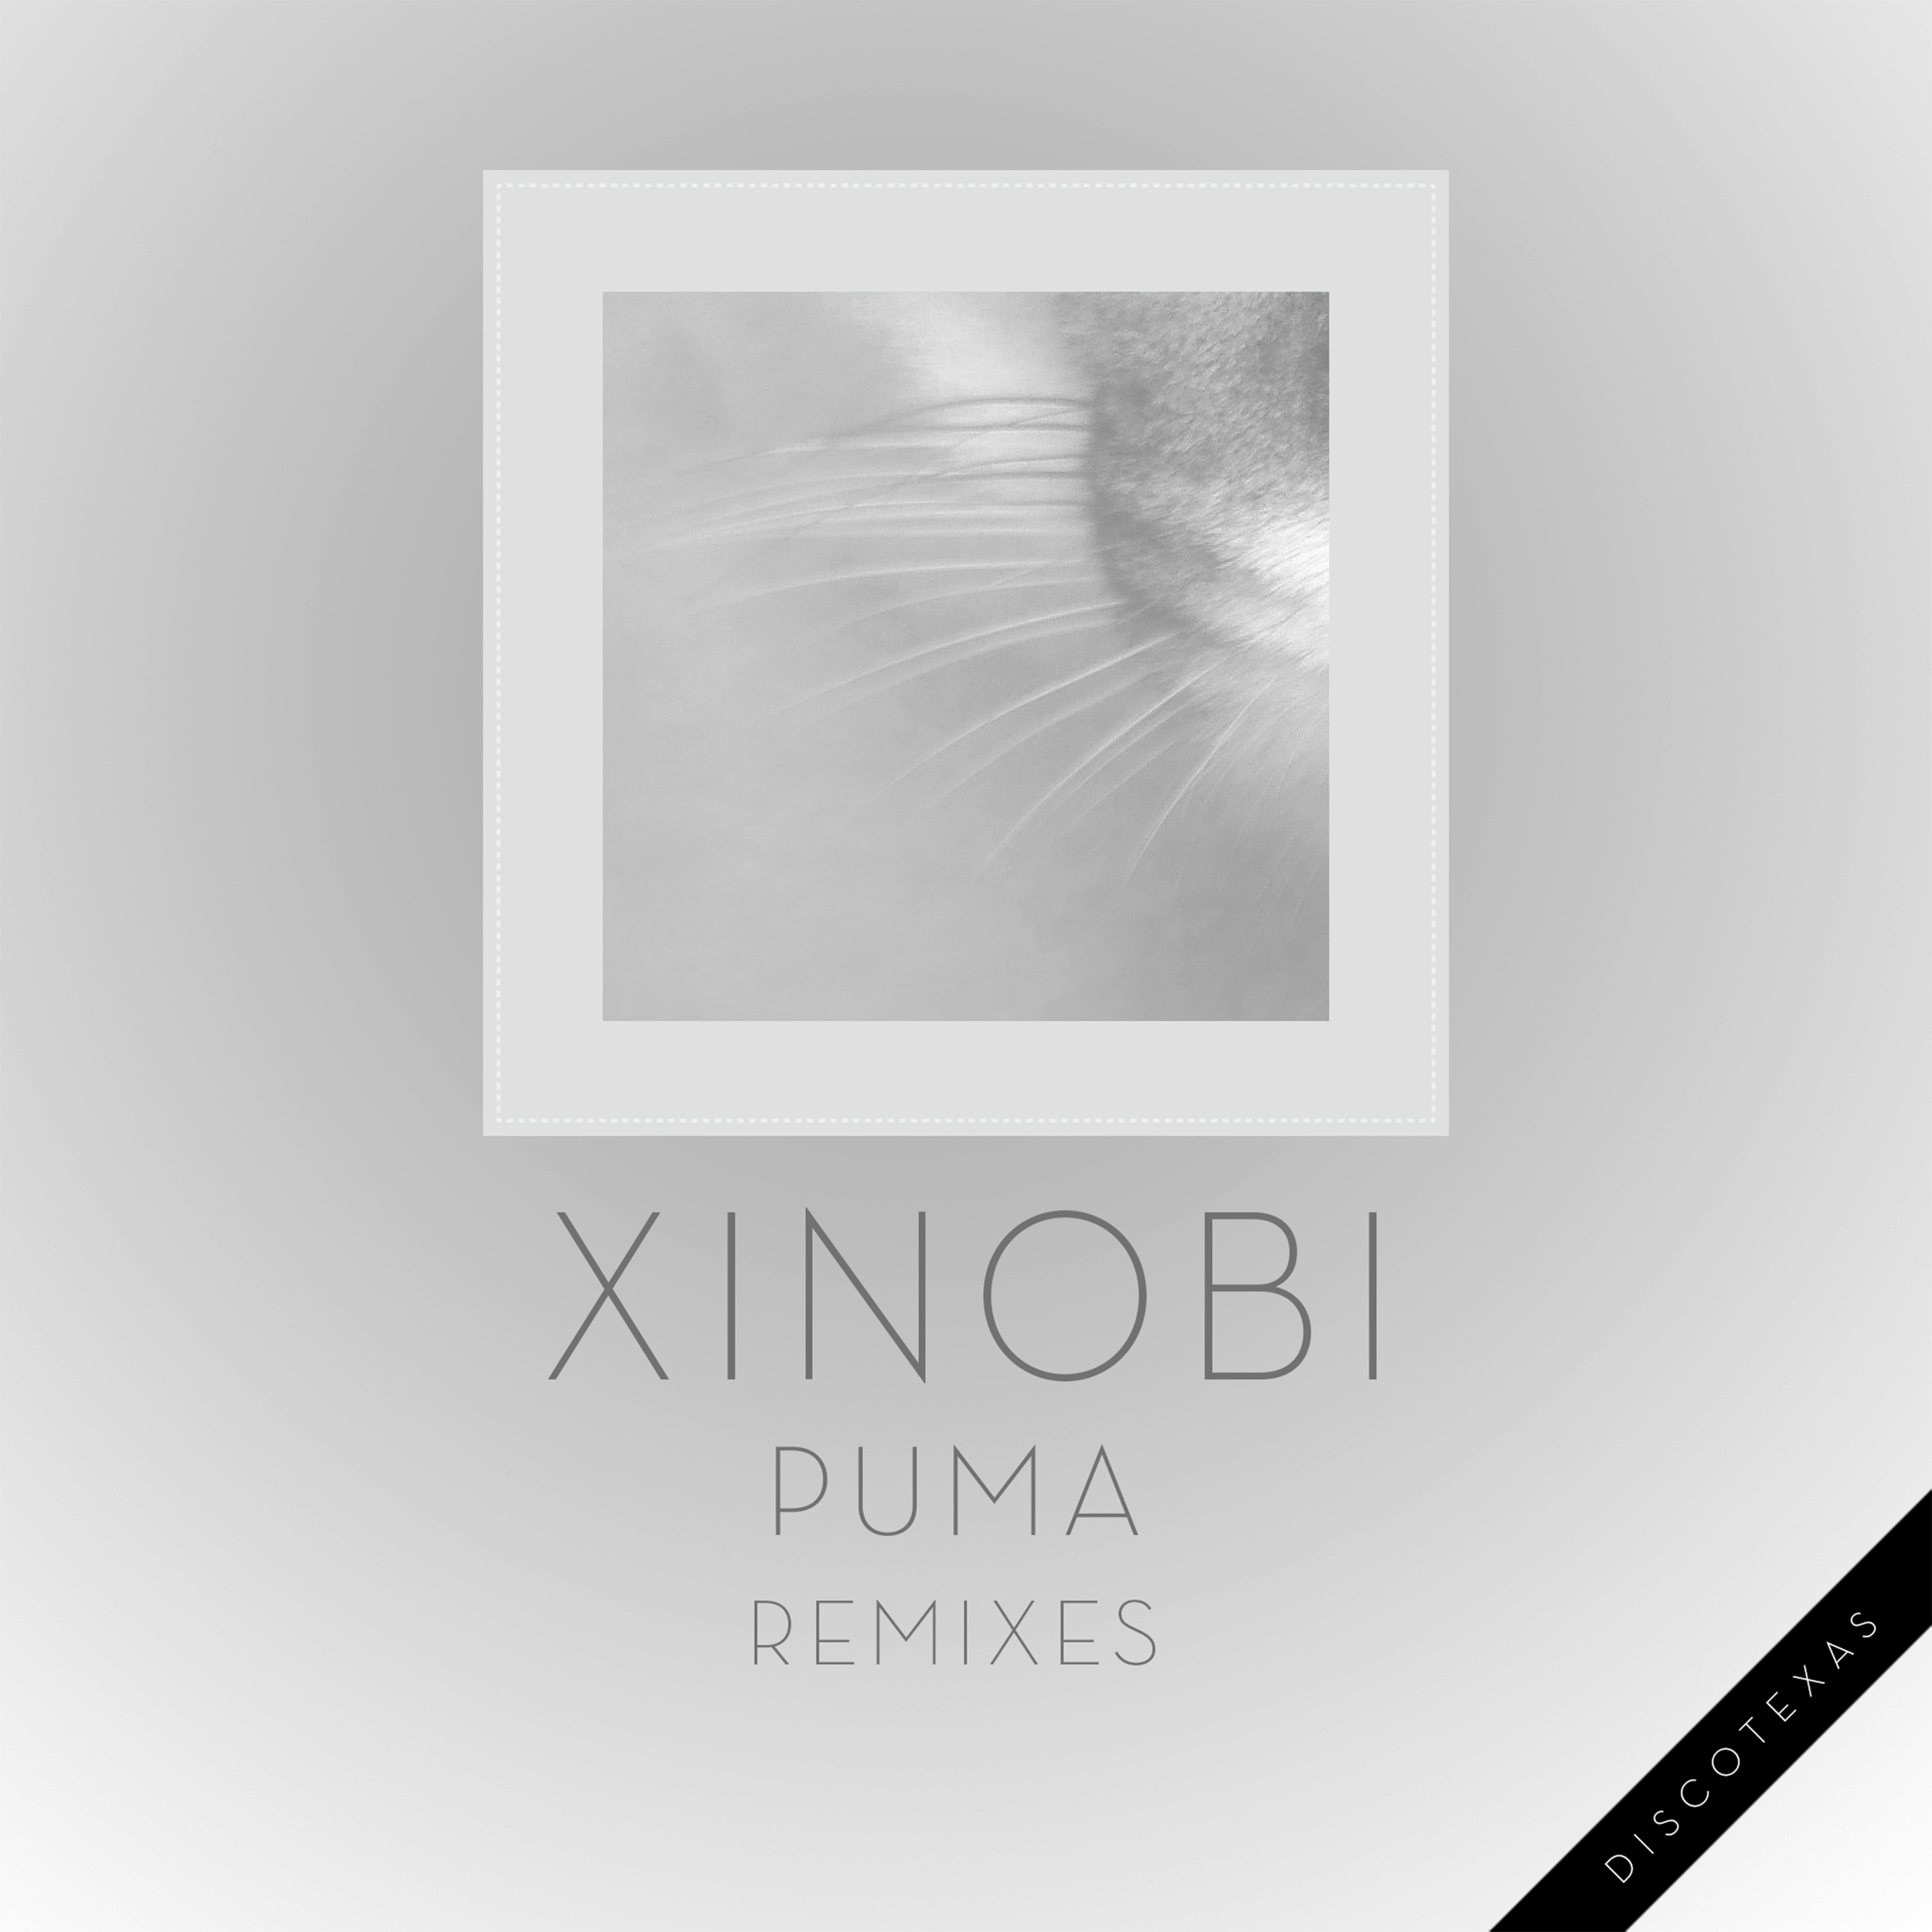 DT041: Xinobi - Puma Remixes